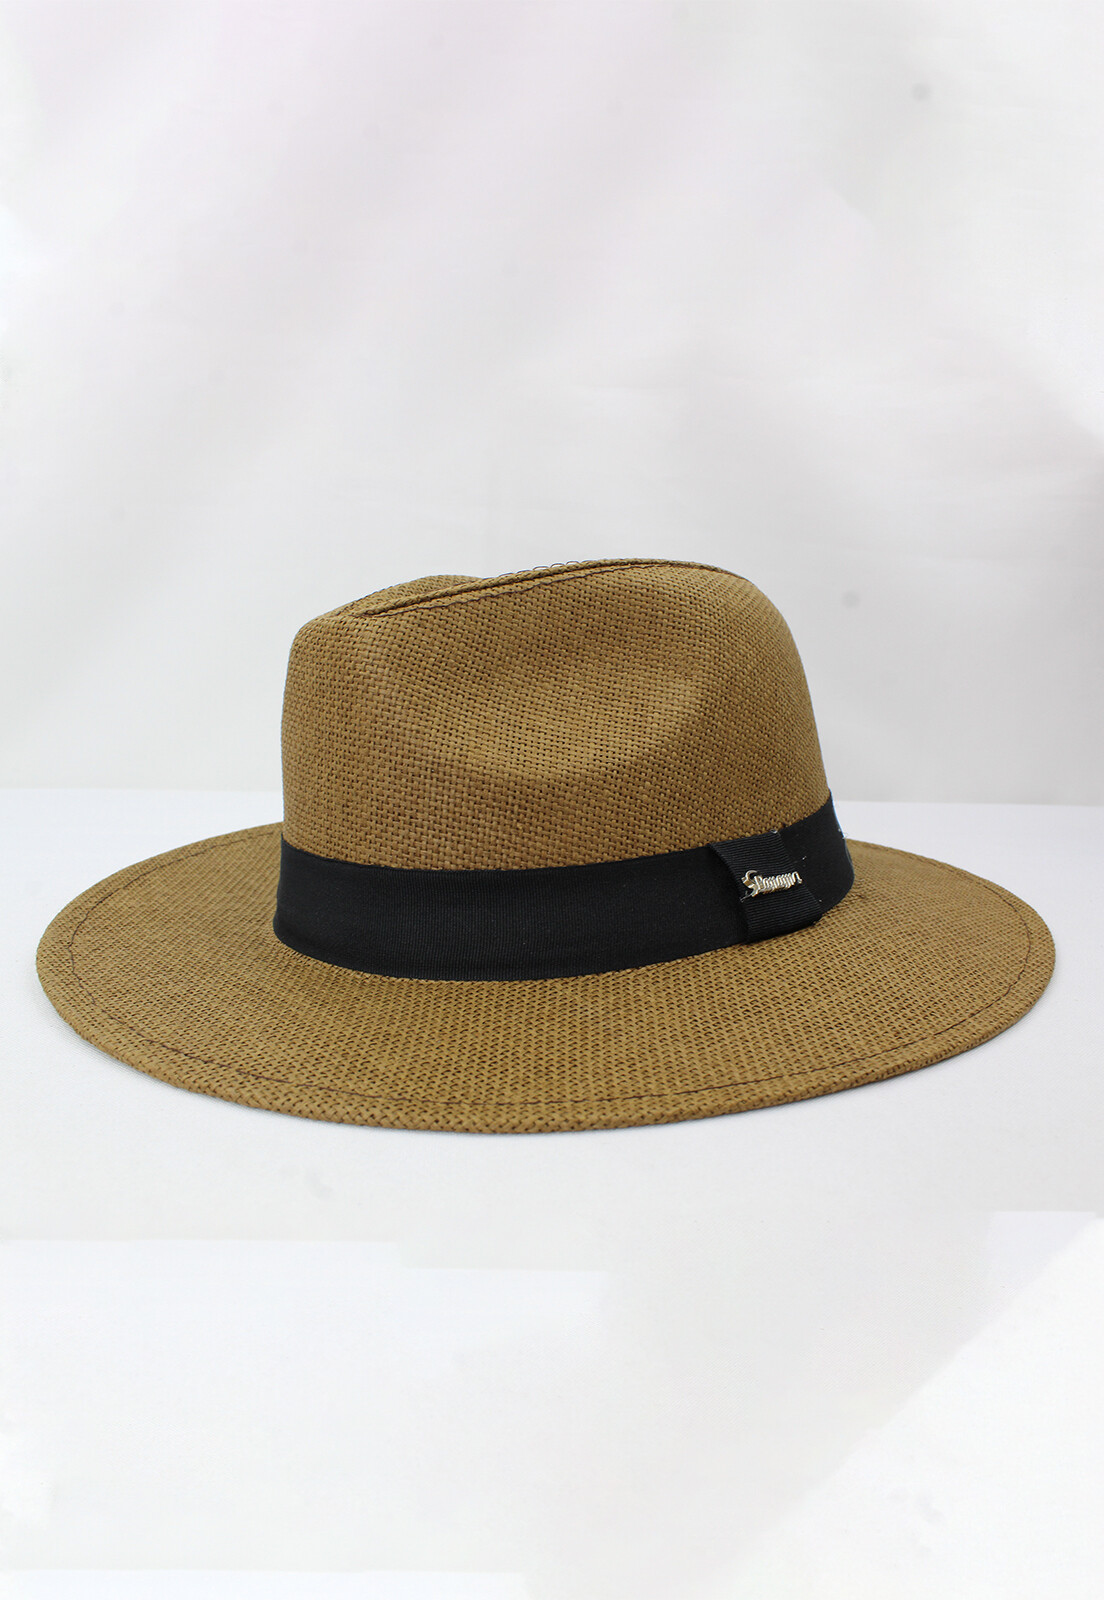 Chapéu em sintético crisfael